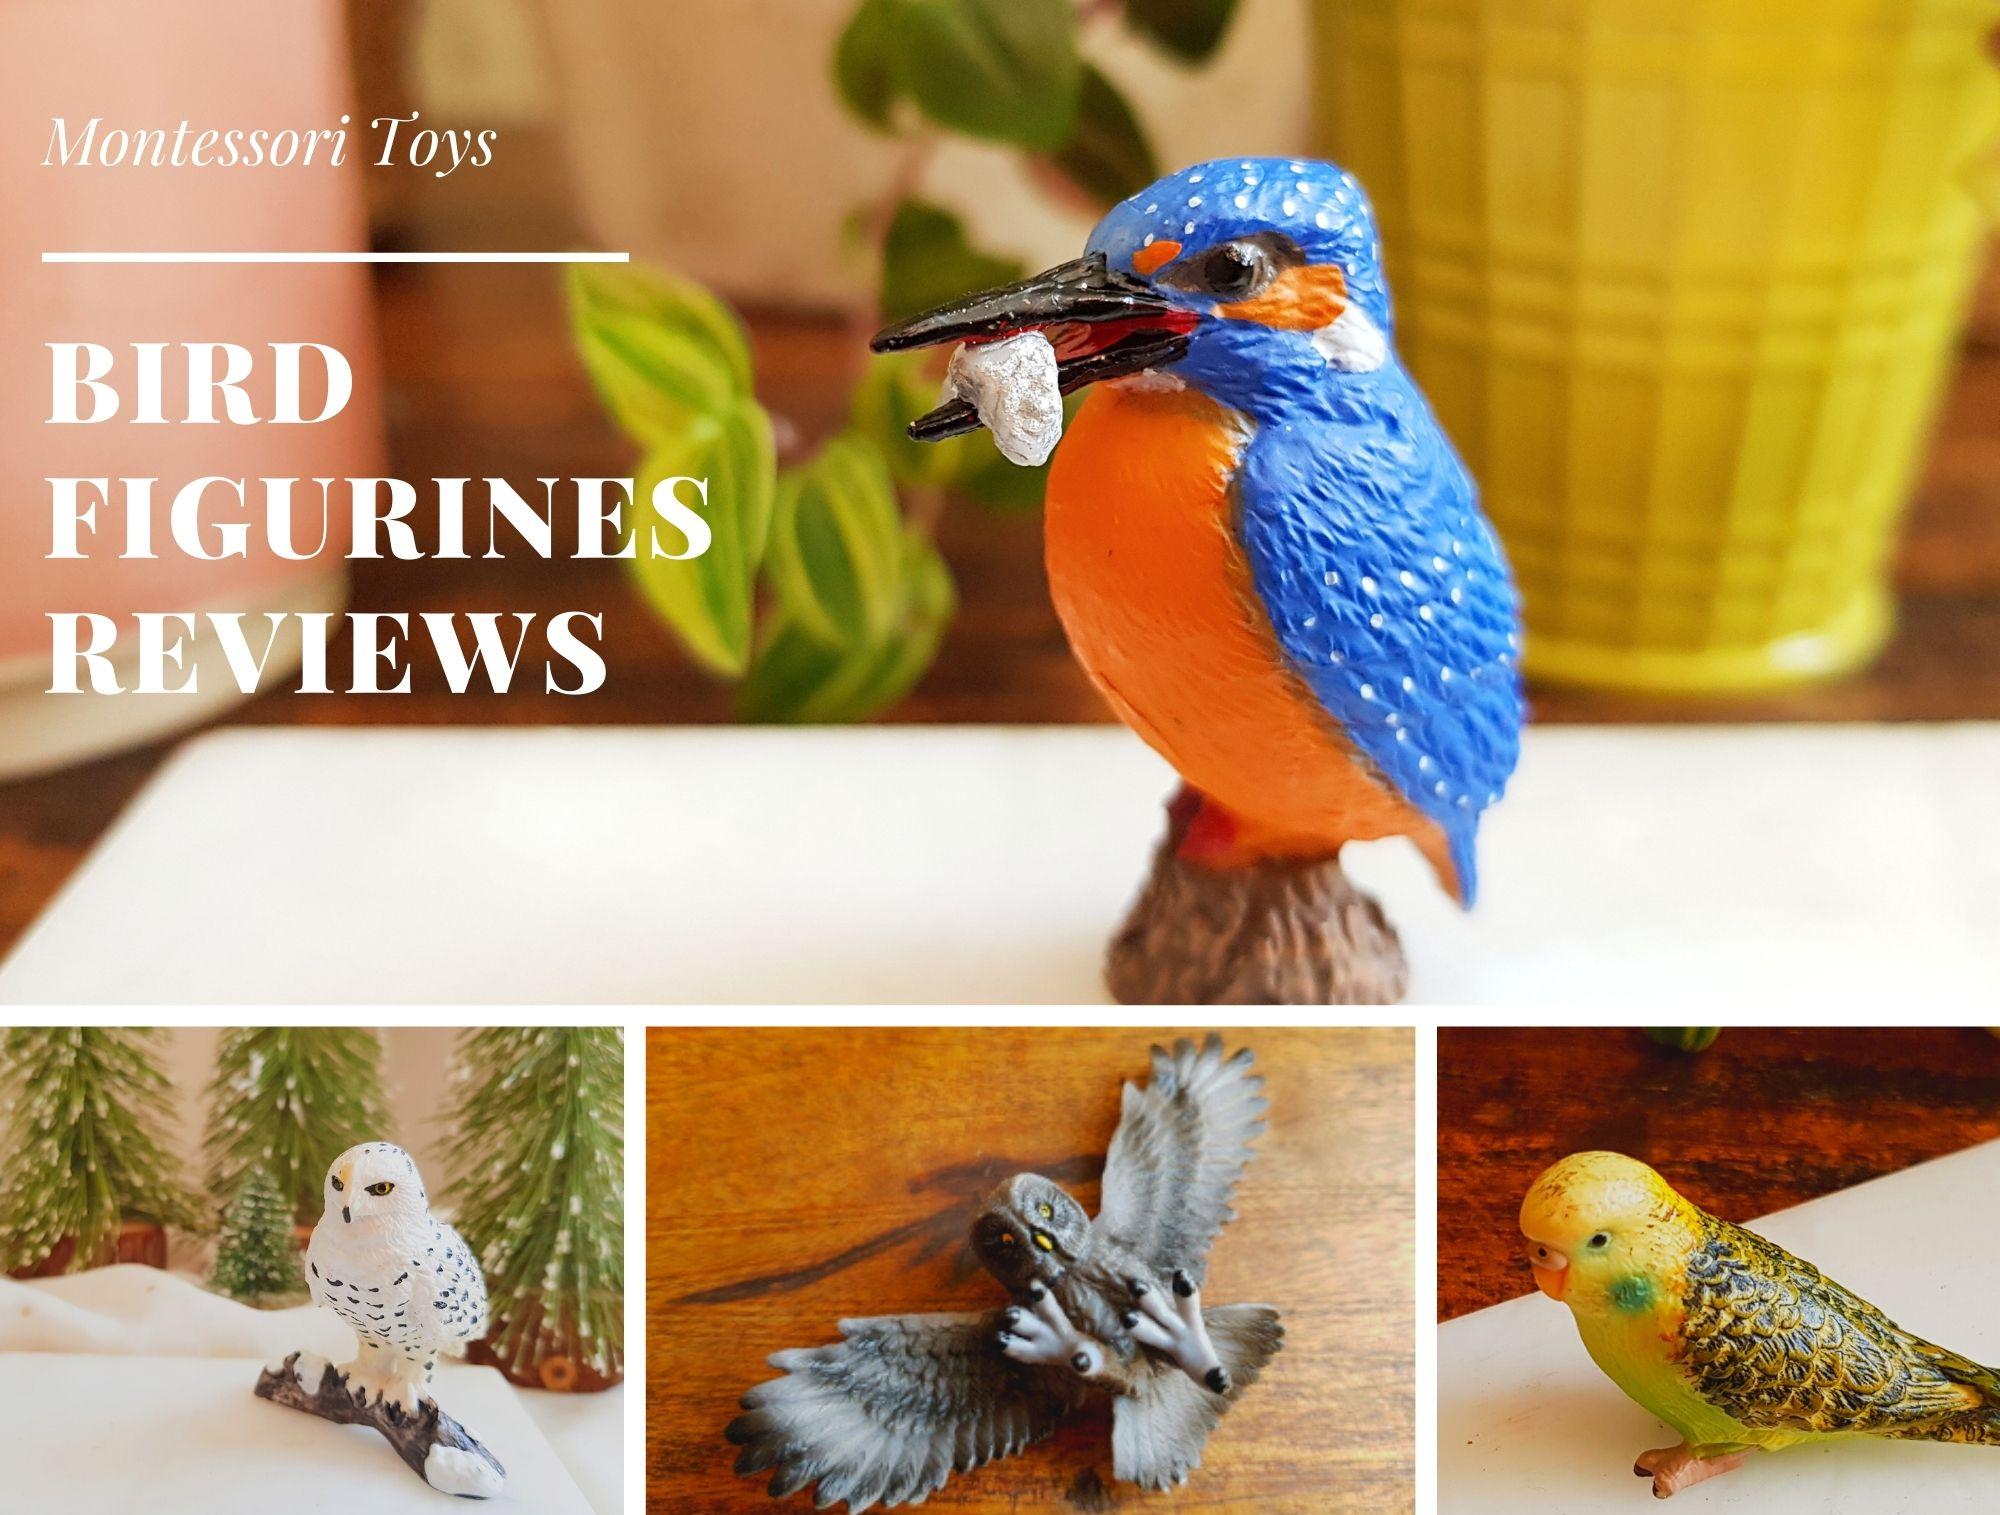 Bird figurines for children- my reviews